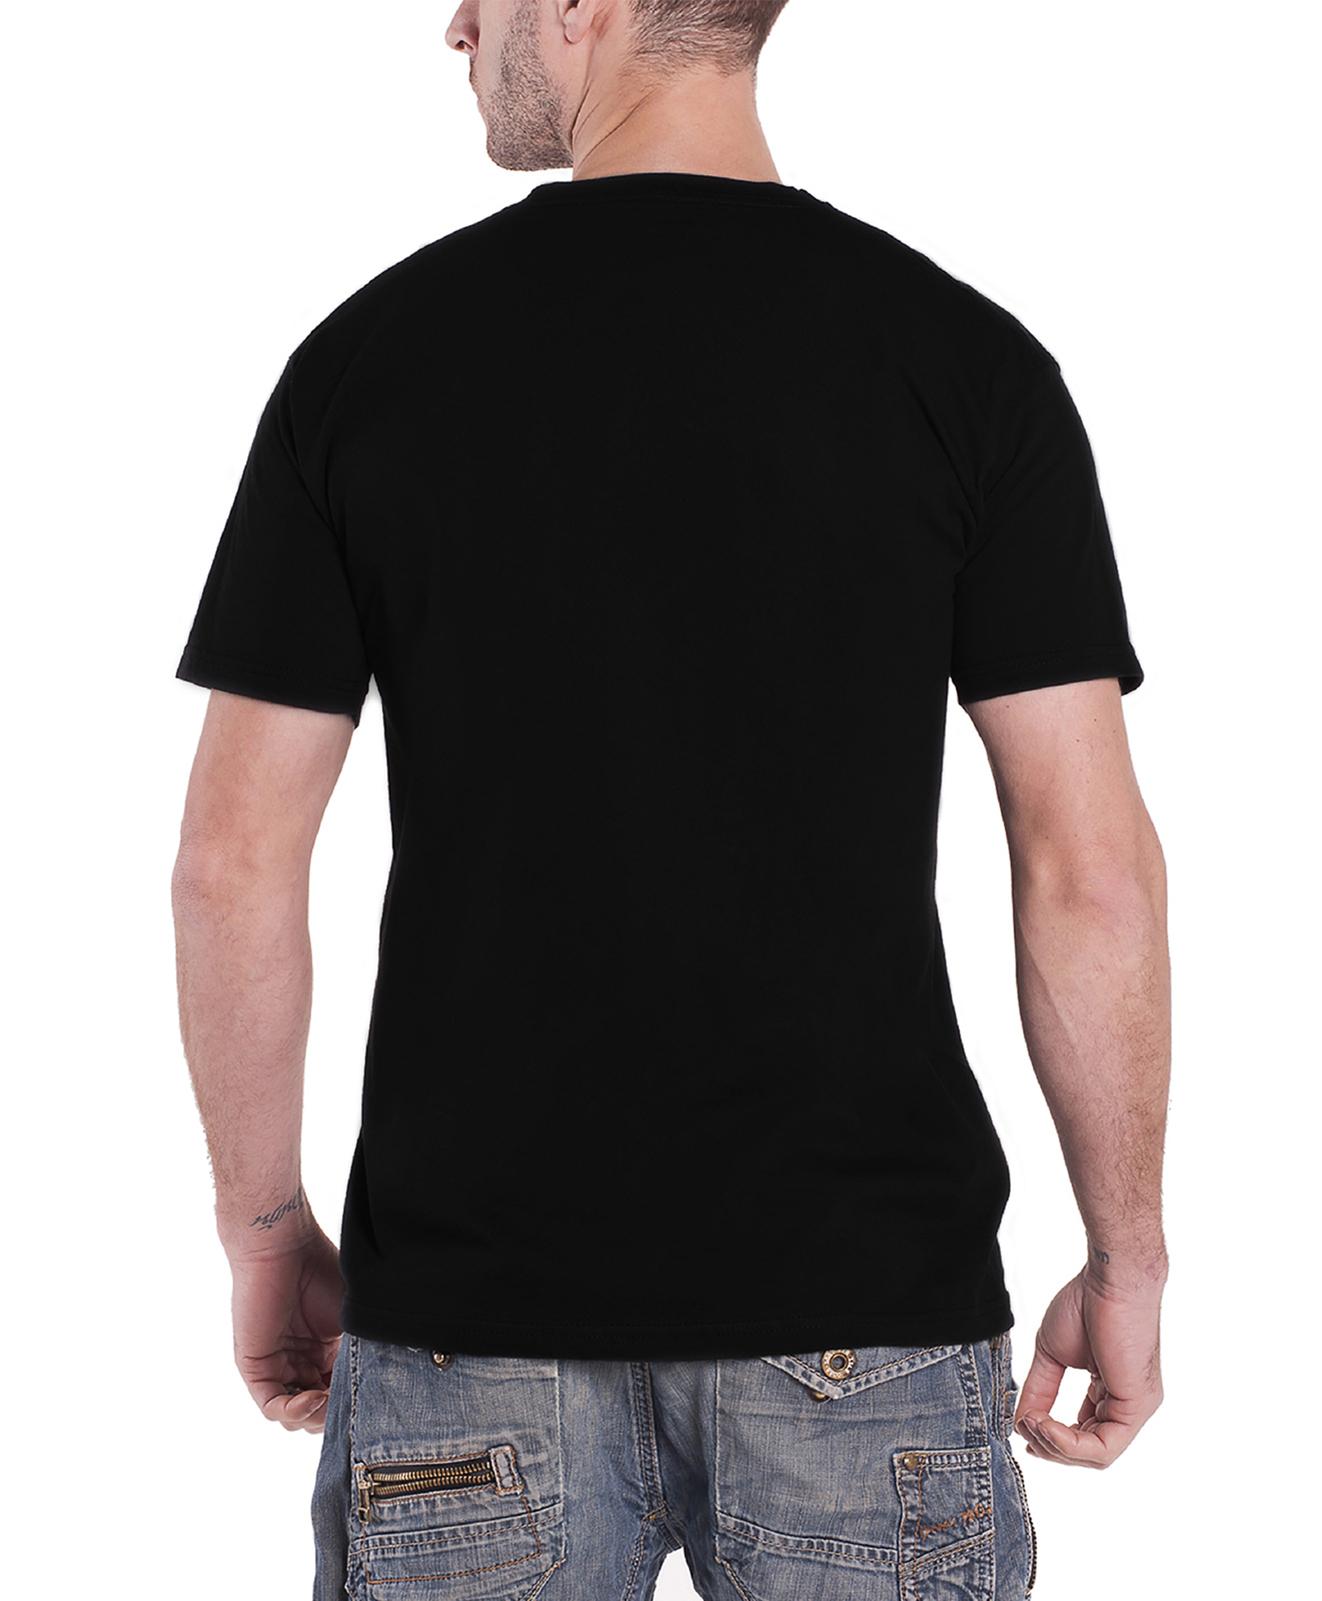 Official-Gas-Monkey-Garage-T-Shirt-Official-GMG-Logo-Kustom-Builds-new-Mens Indexbild 23